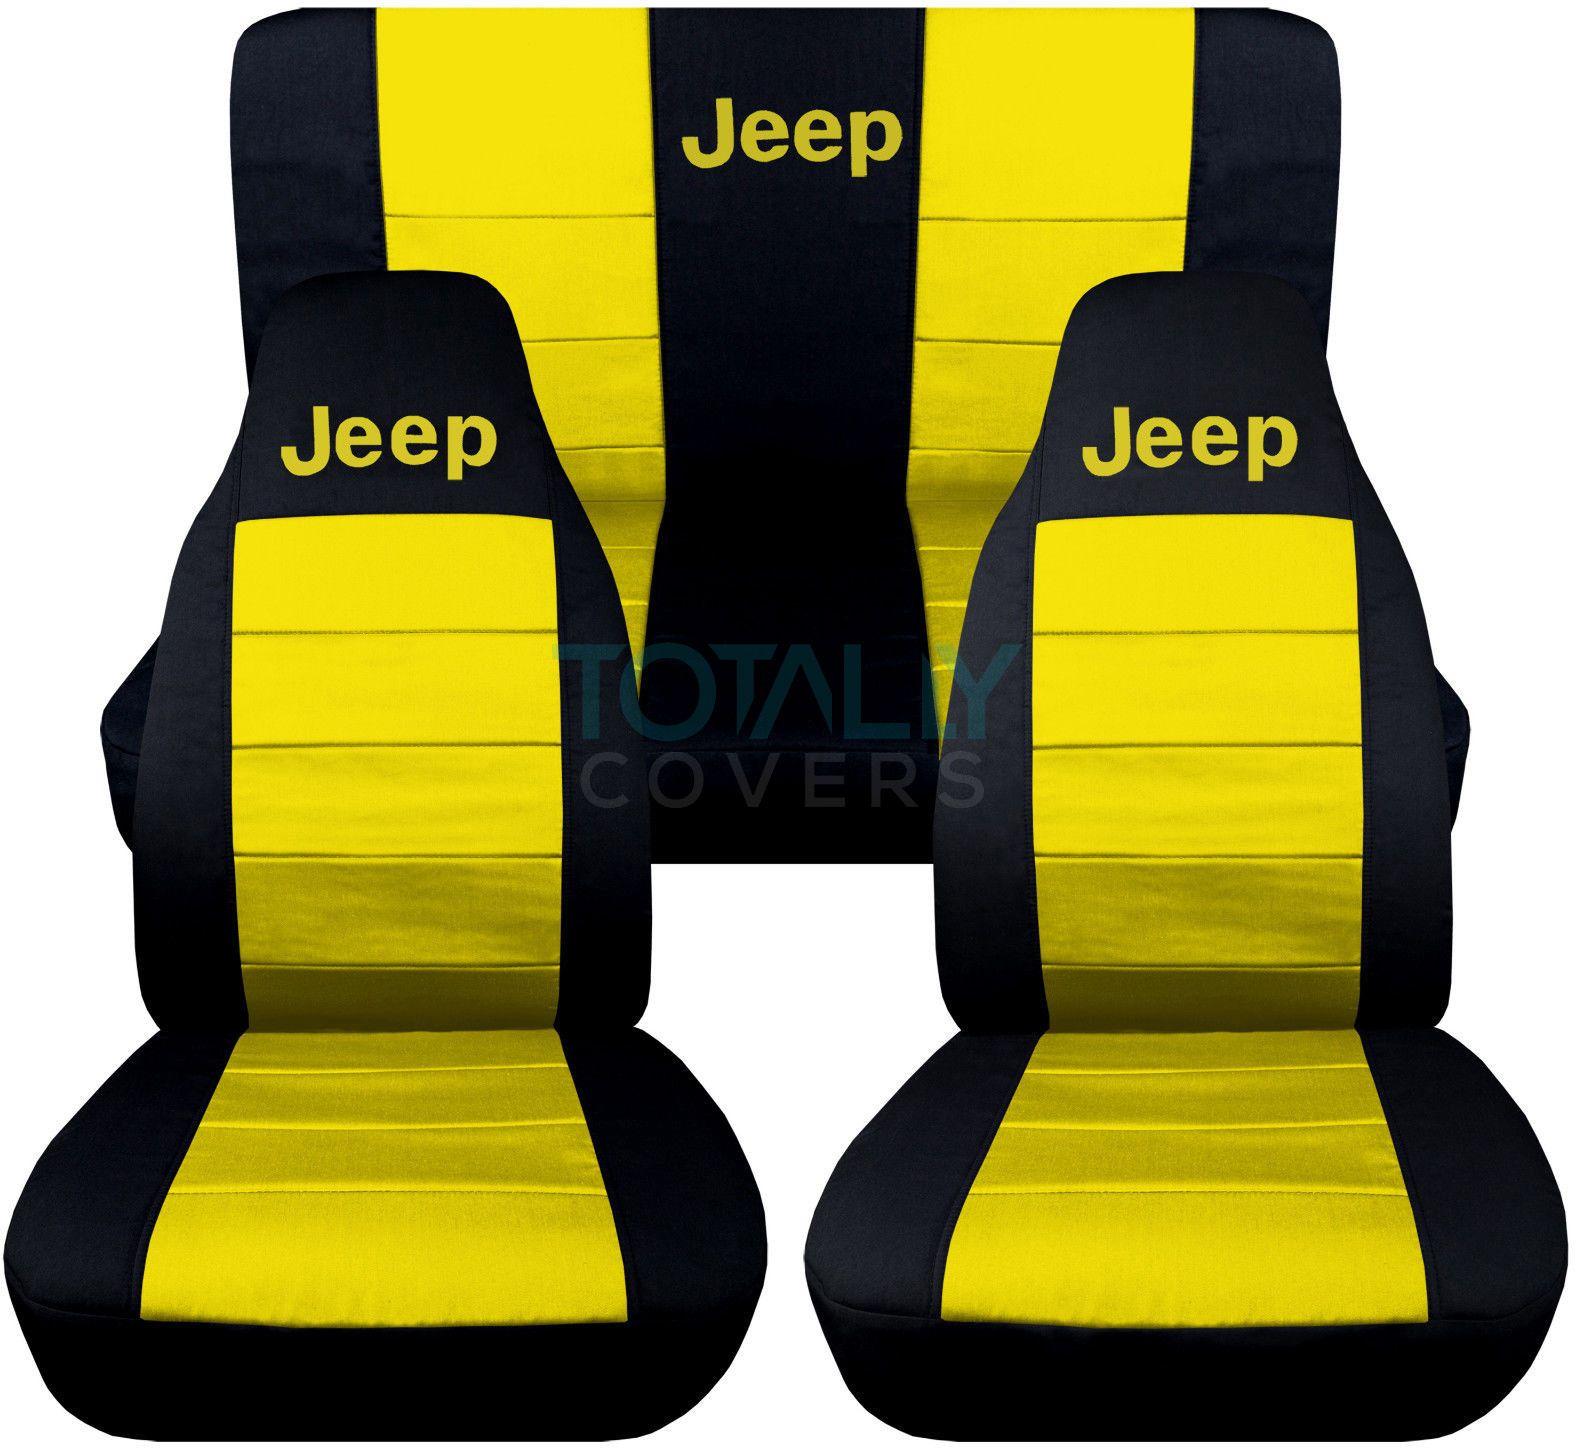 Details About Jeep Wrangler Yj Tj Jk Jl 1987 2020 2 Tone Seat